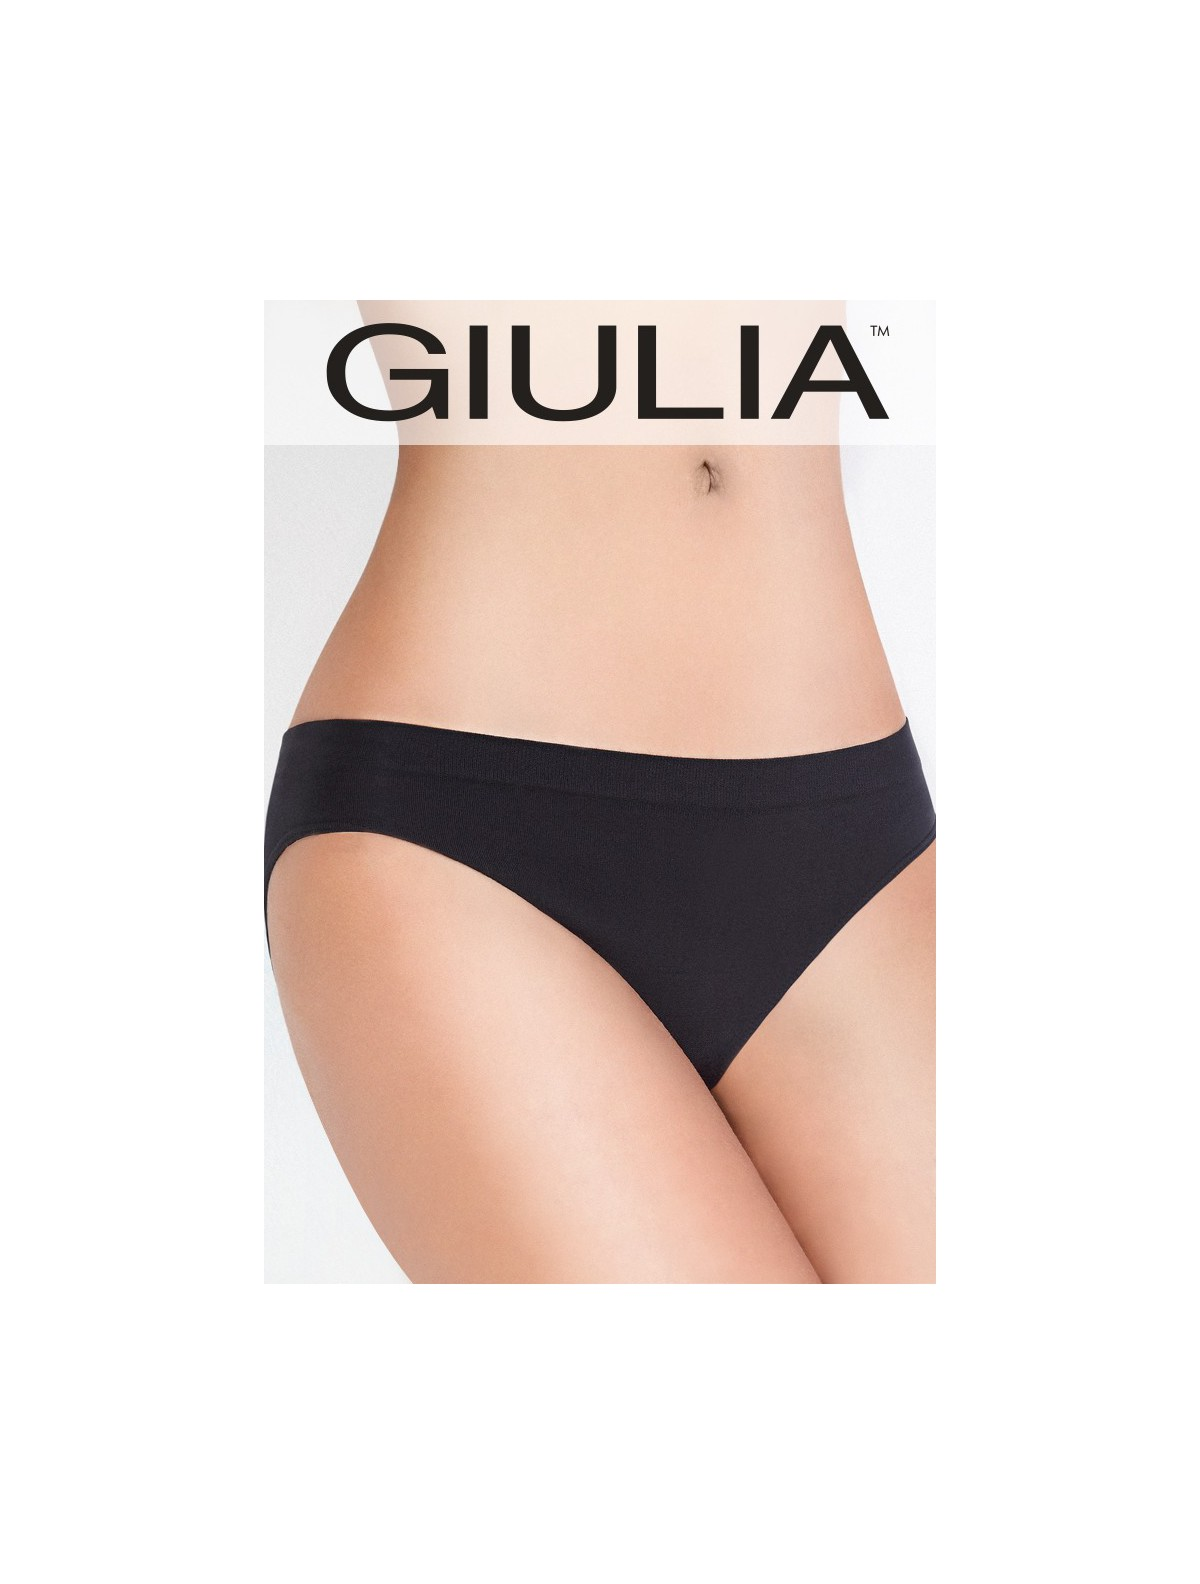 giulia vita microfiber seamless bikini panty. Black Bedroom Furniture Sets. Home Design Ideas